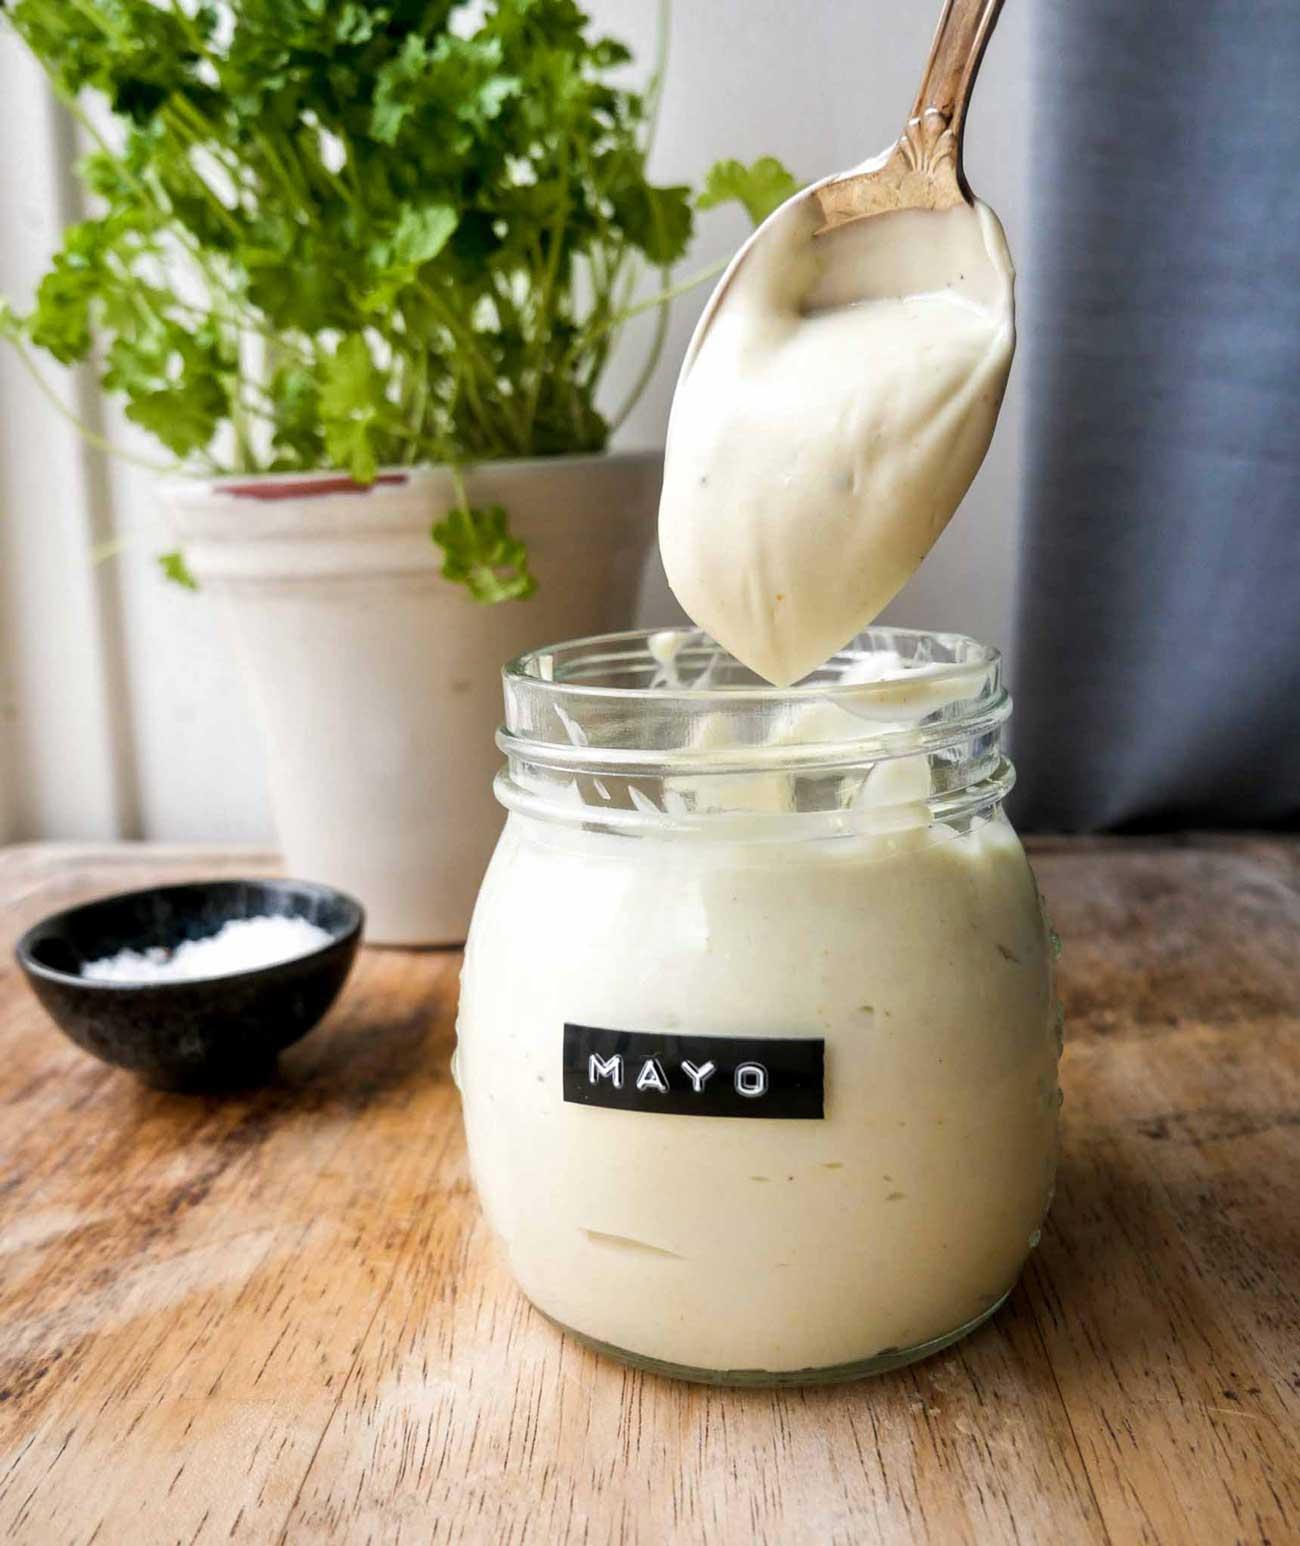 vegansk mayonnaise nem opskrift til smørrebrød